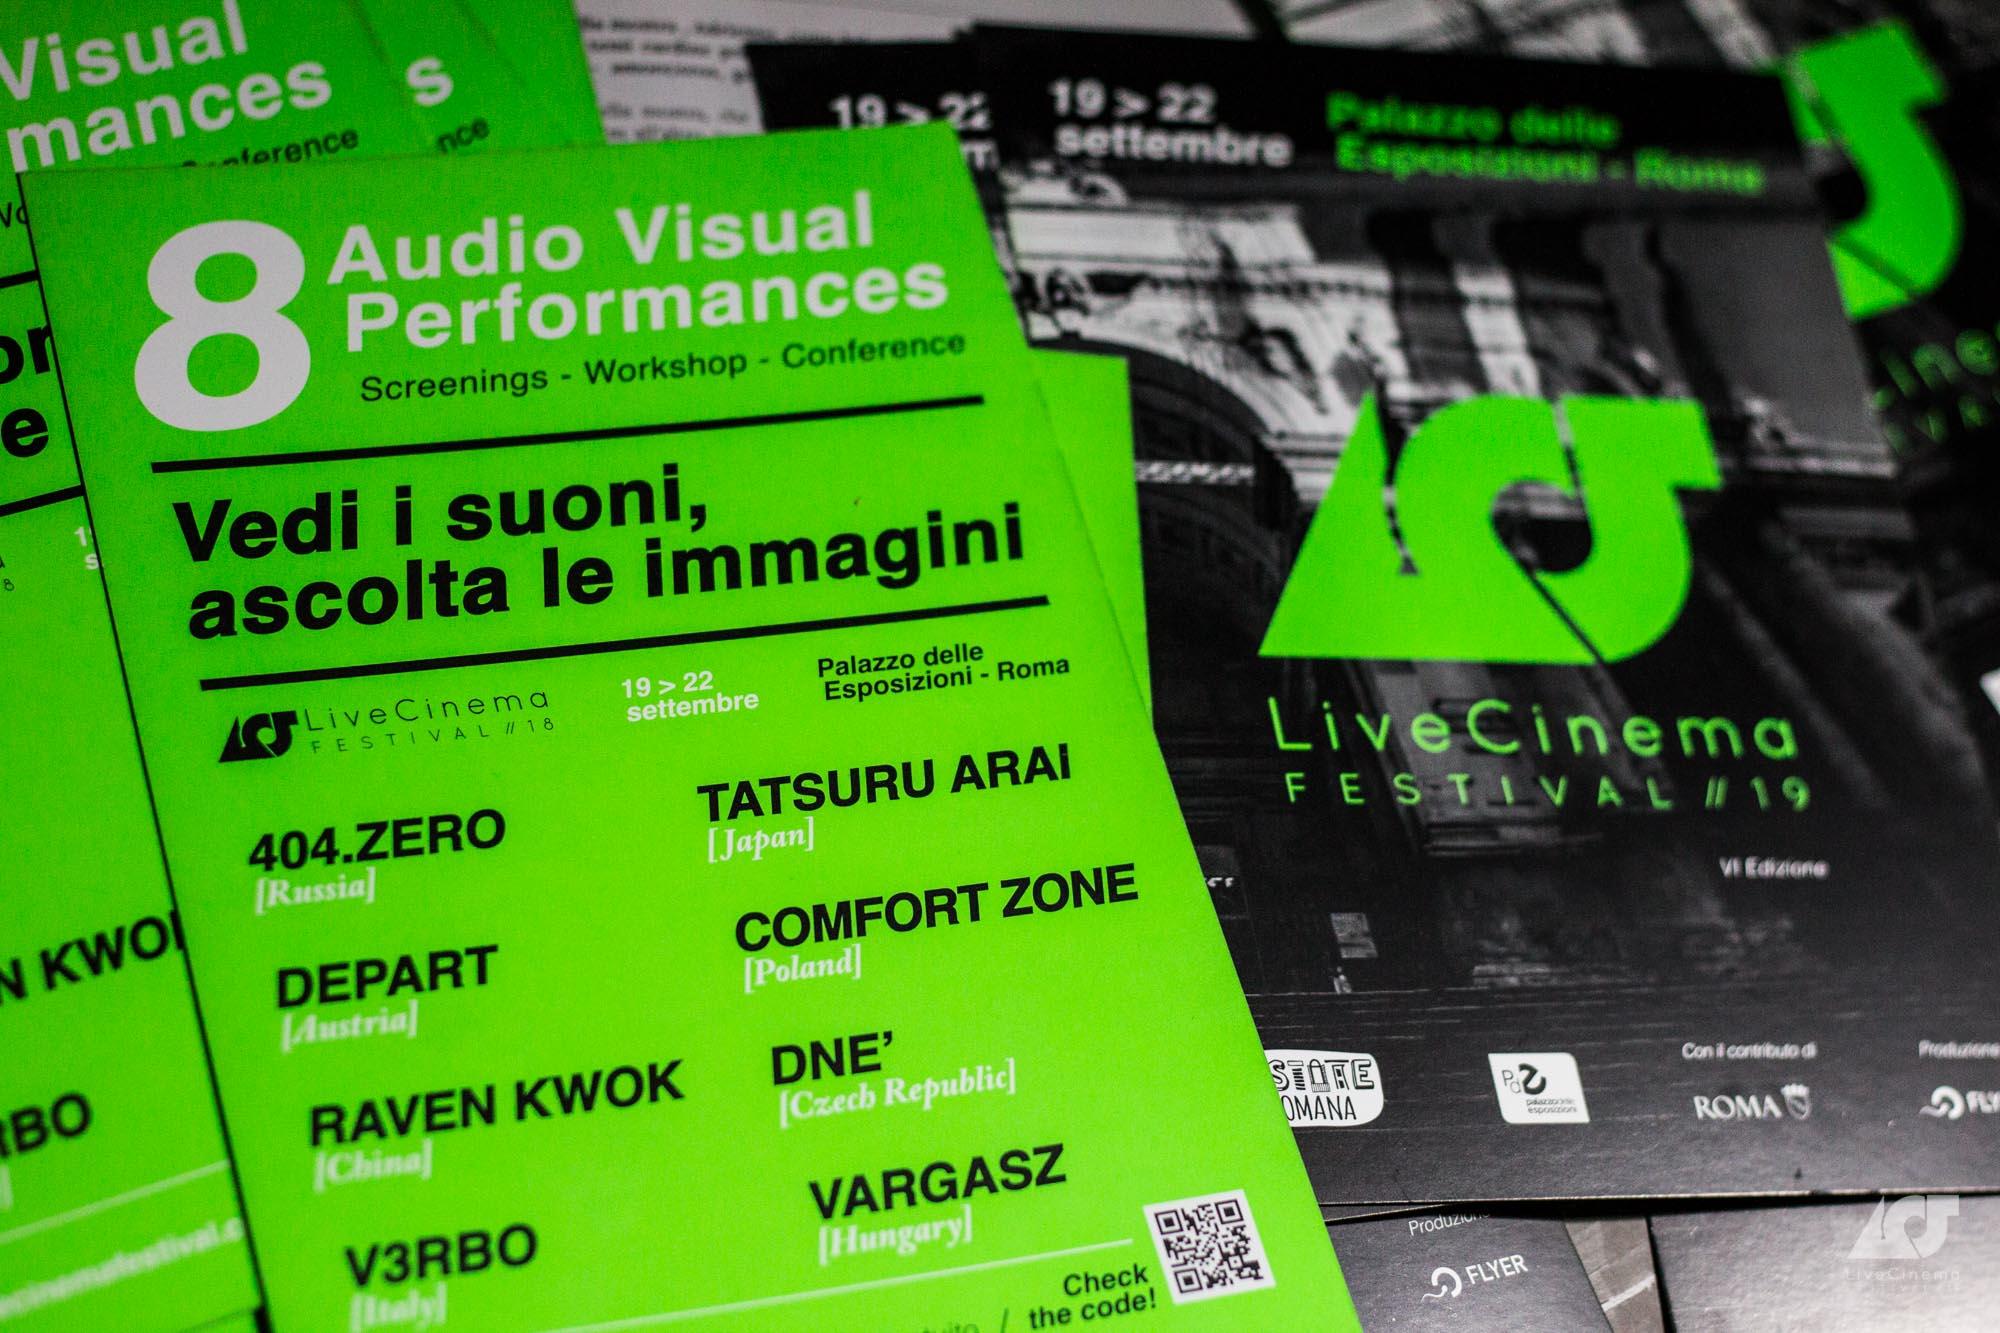 elisa antonacci Live Cinema Festival 2019 flyer